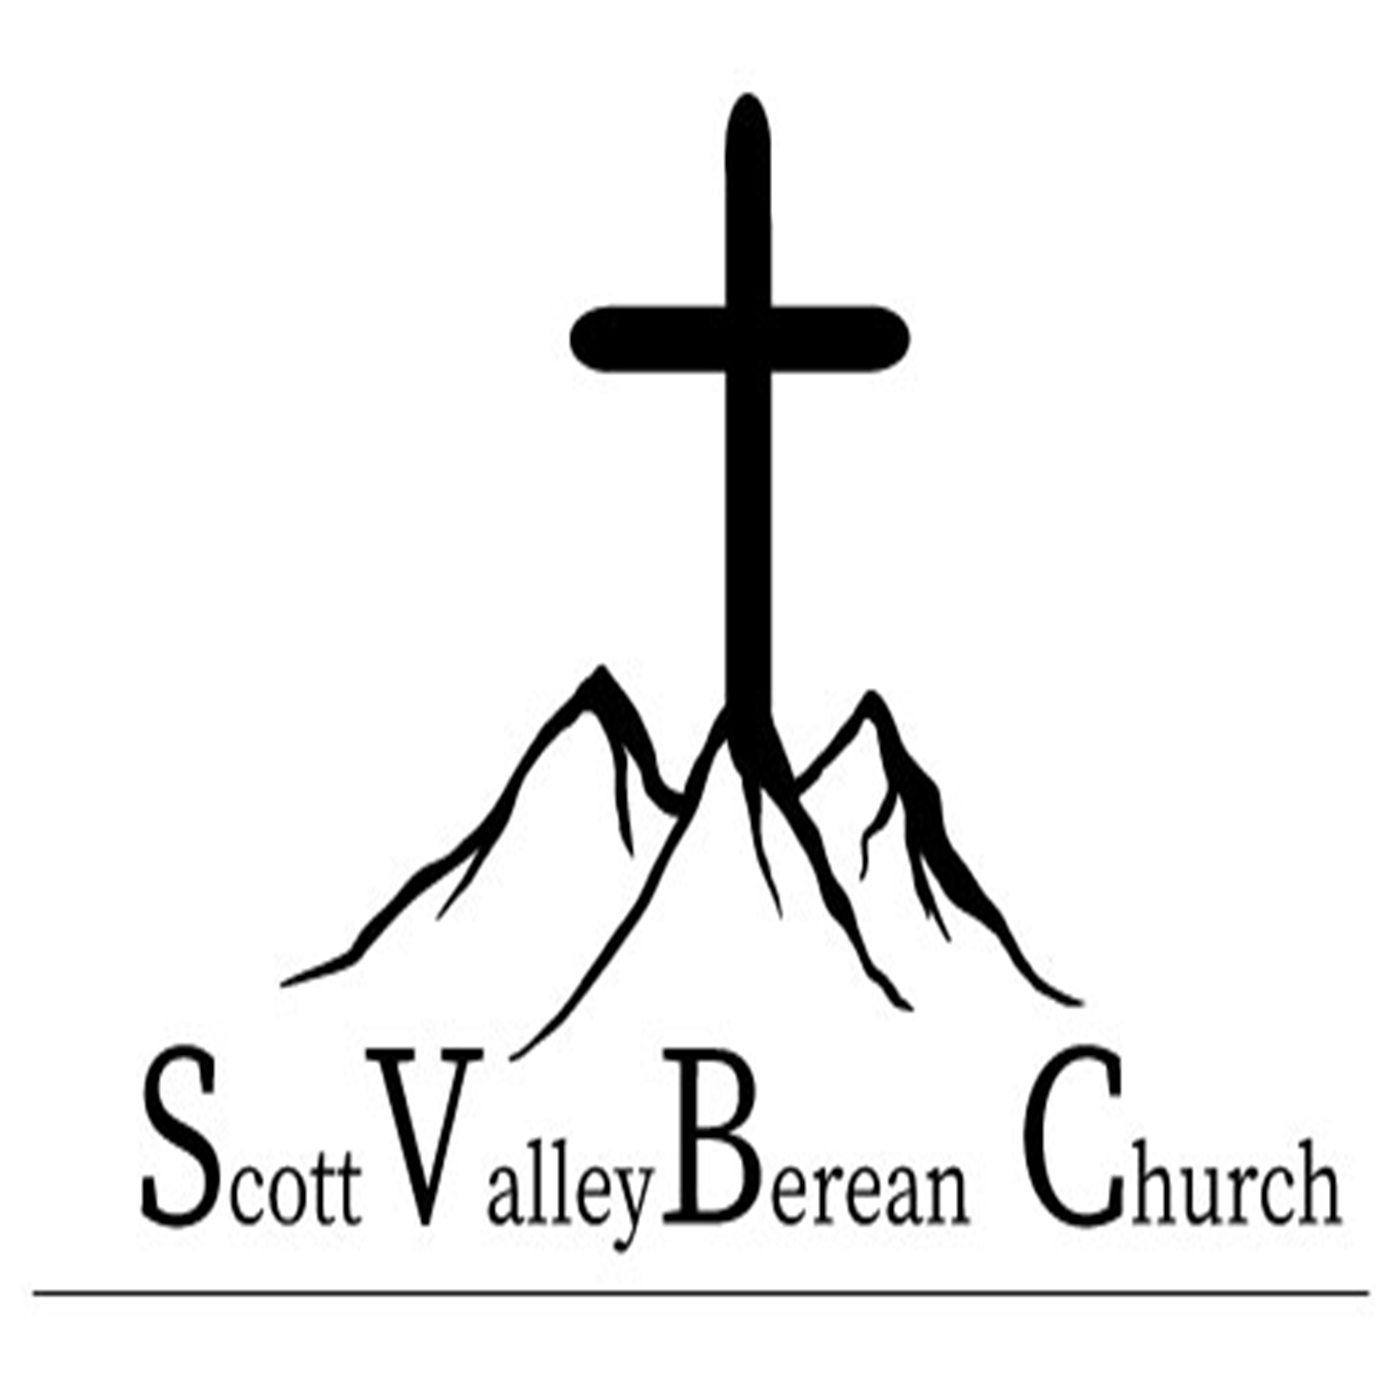 Scott Valley Berean Church